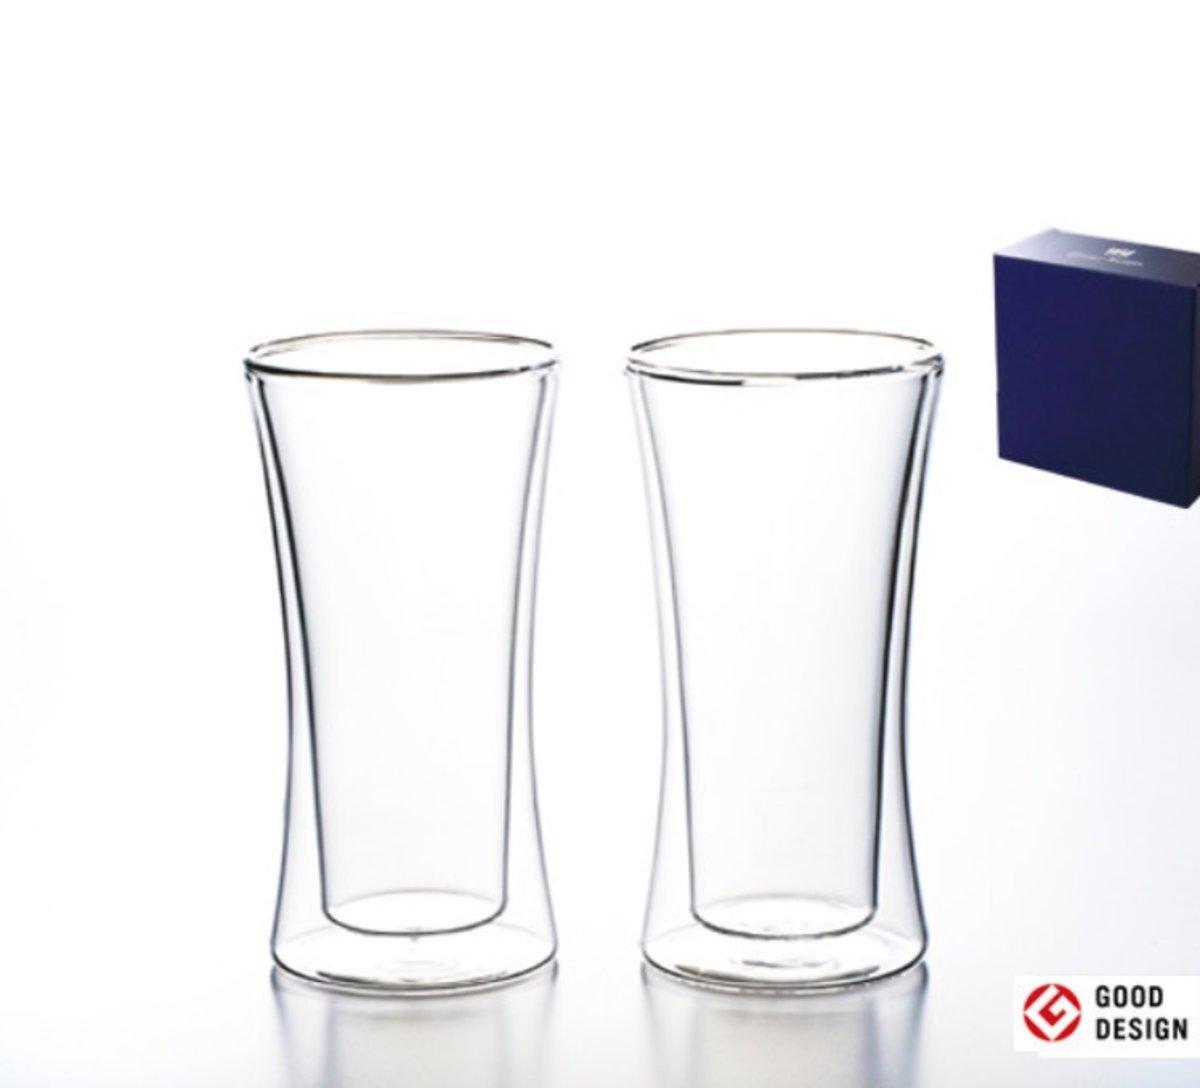 GOOD DESIGN AWARD - Set of 2 pcs - 180 Degree Heat resistant / Double-Layer Glass Gift Set